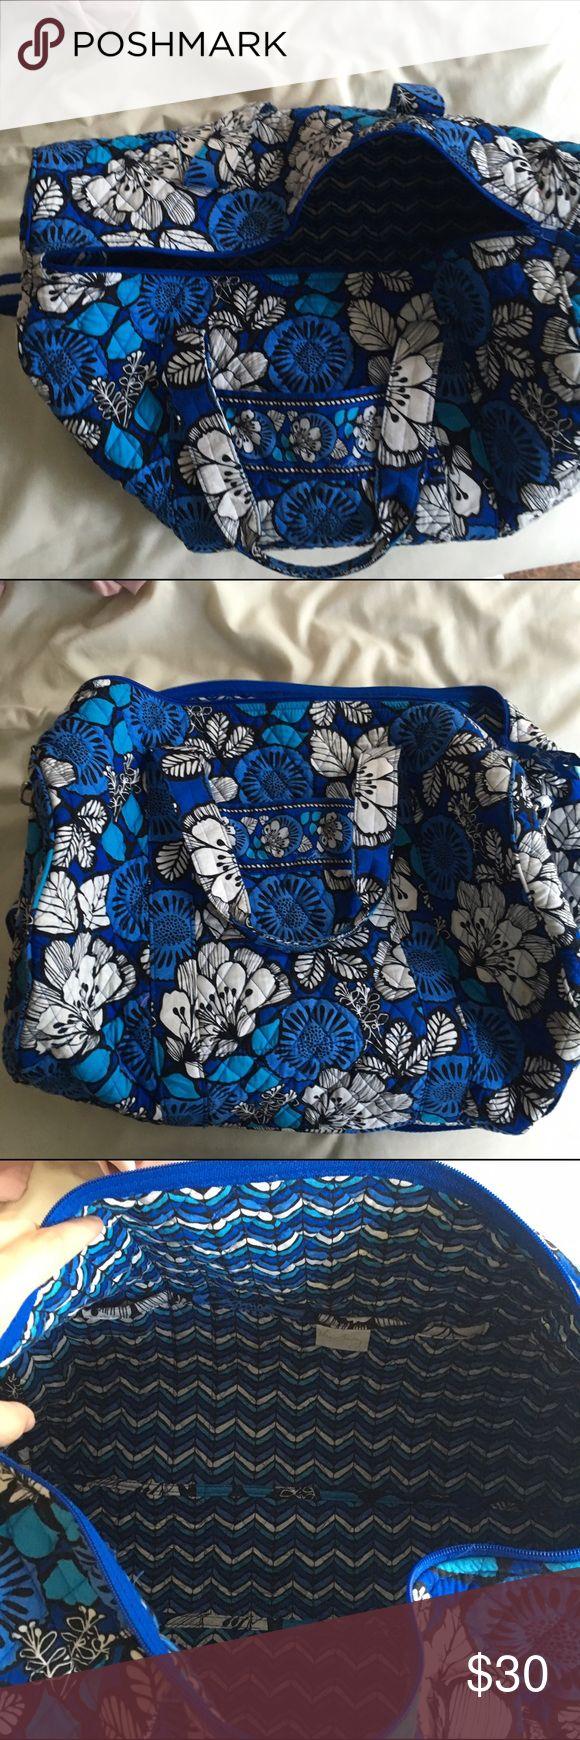 Vera Bradley duffel bag Blue printed Vera Bradley duffel bag. Has a pocket on the inside. Perfect for traveling! Vera Bradley Bags Travel Bags